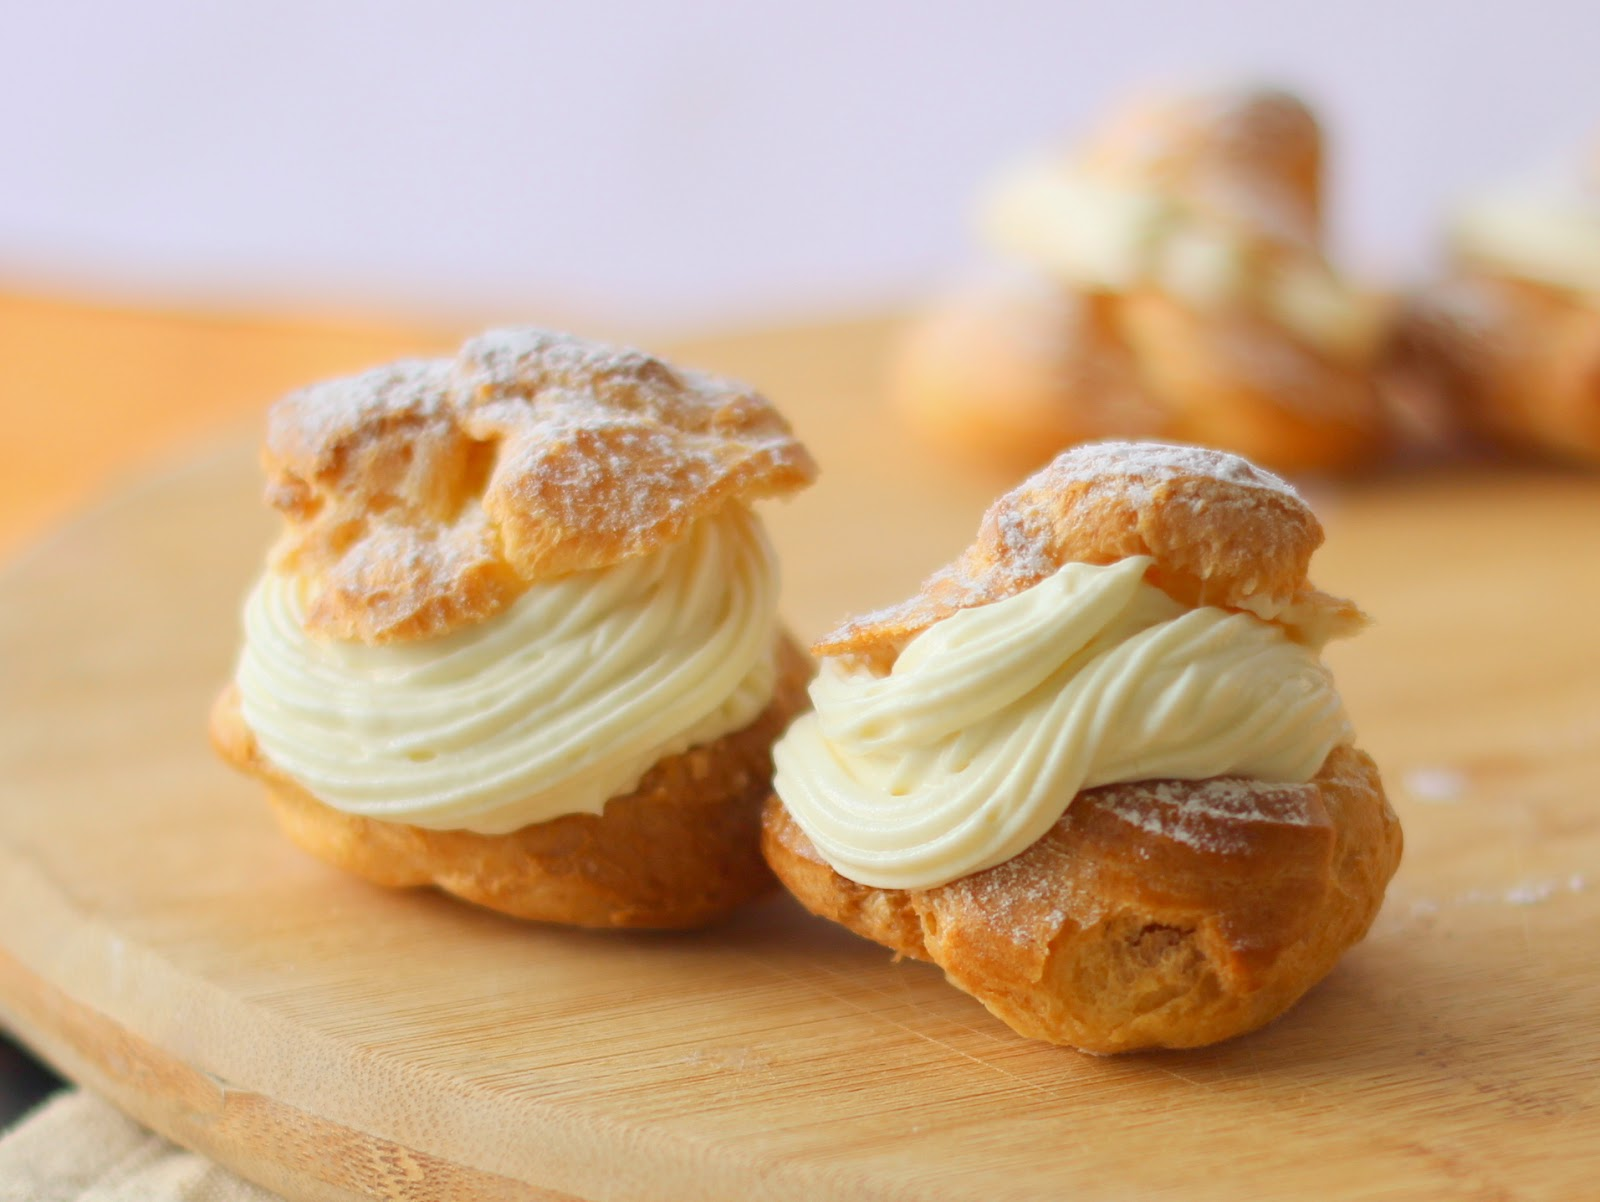 The Informal Chef: Easy Pastry Cream/Crème Pâtissière 卡士达奶油